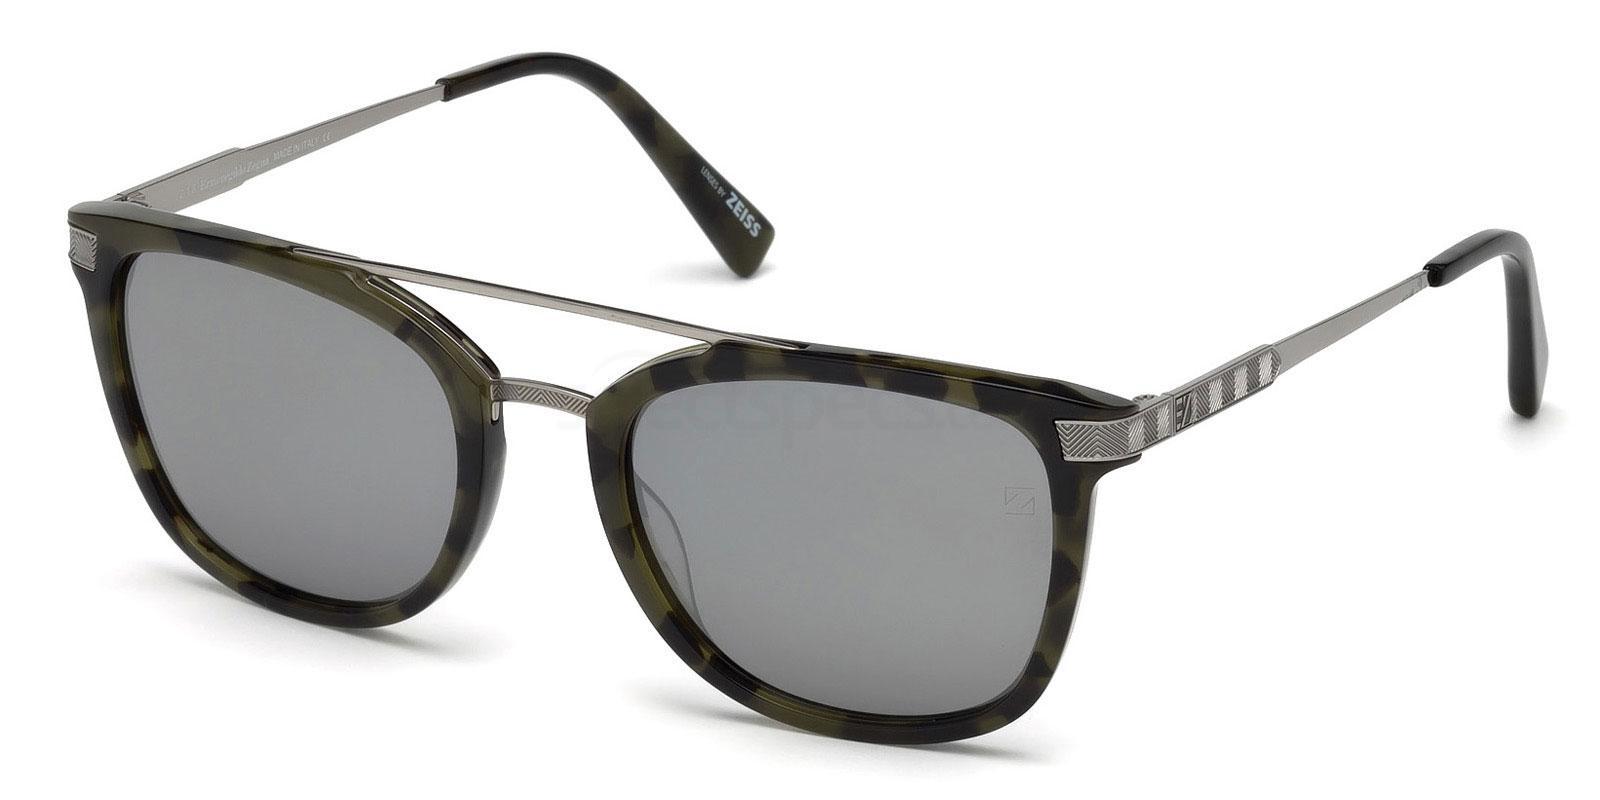 55C EZ0078 Sunglasses, Ermenegildo Zegna